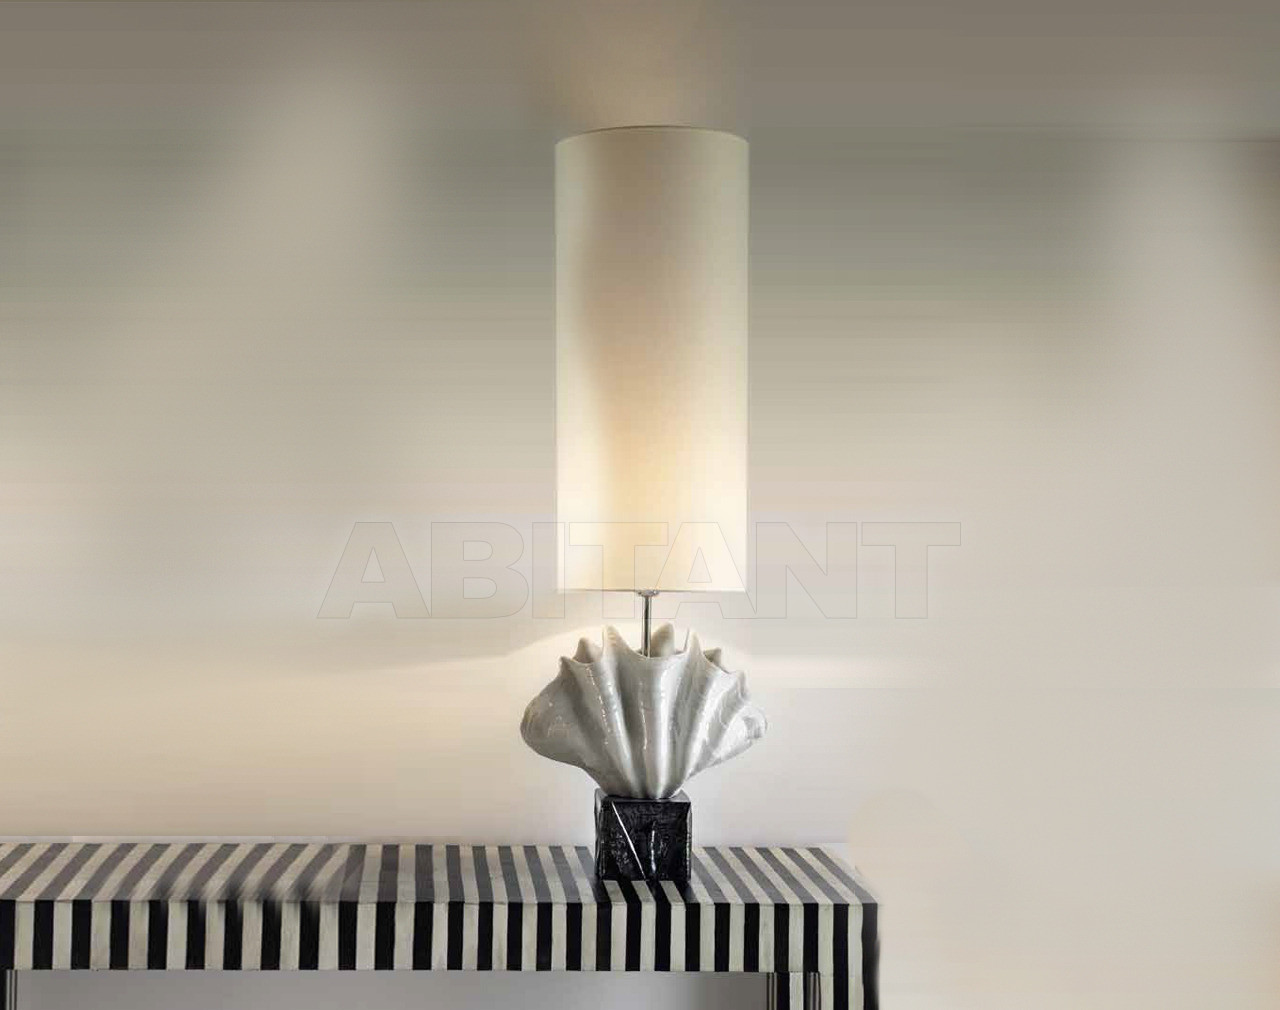 Купить Лампа настольная SEE VASE LAMP Villari Grande Opera Ii 0000482-103